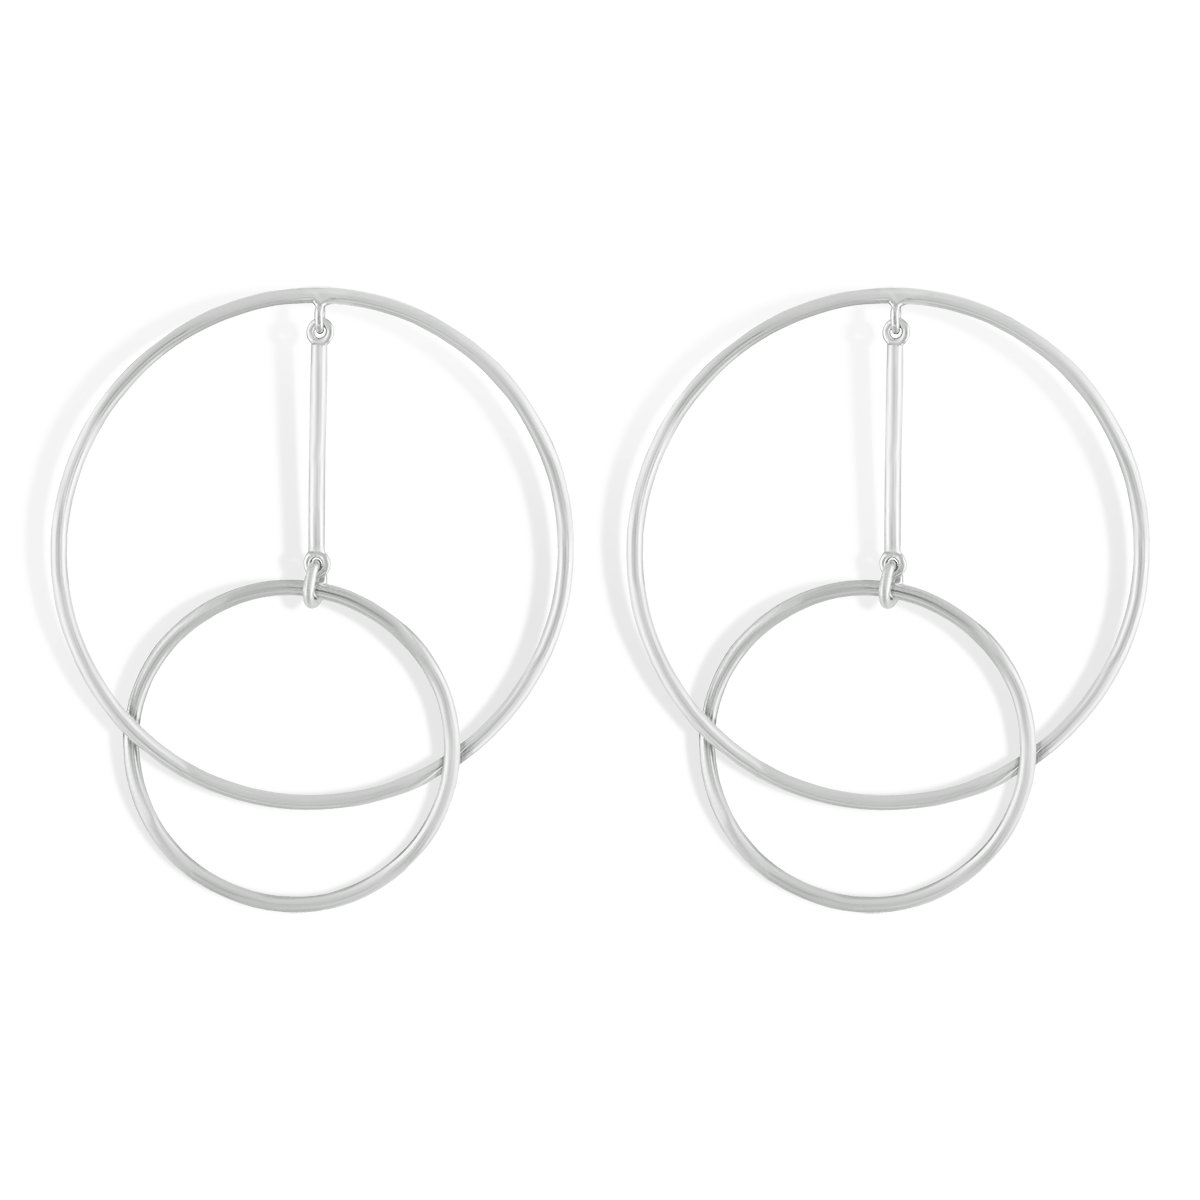 گوشواره نقره رینگز Rings